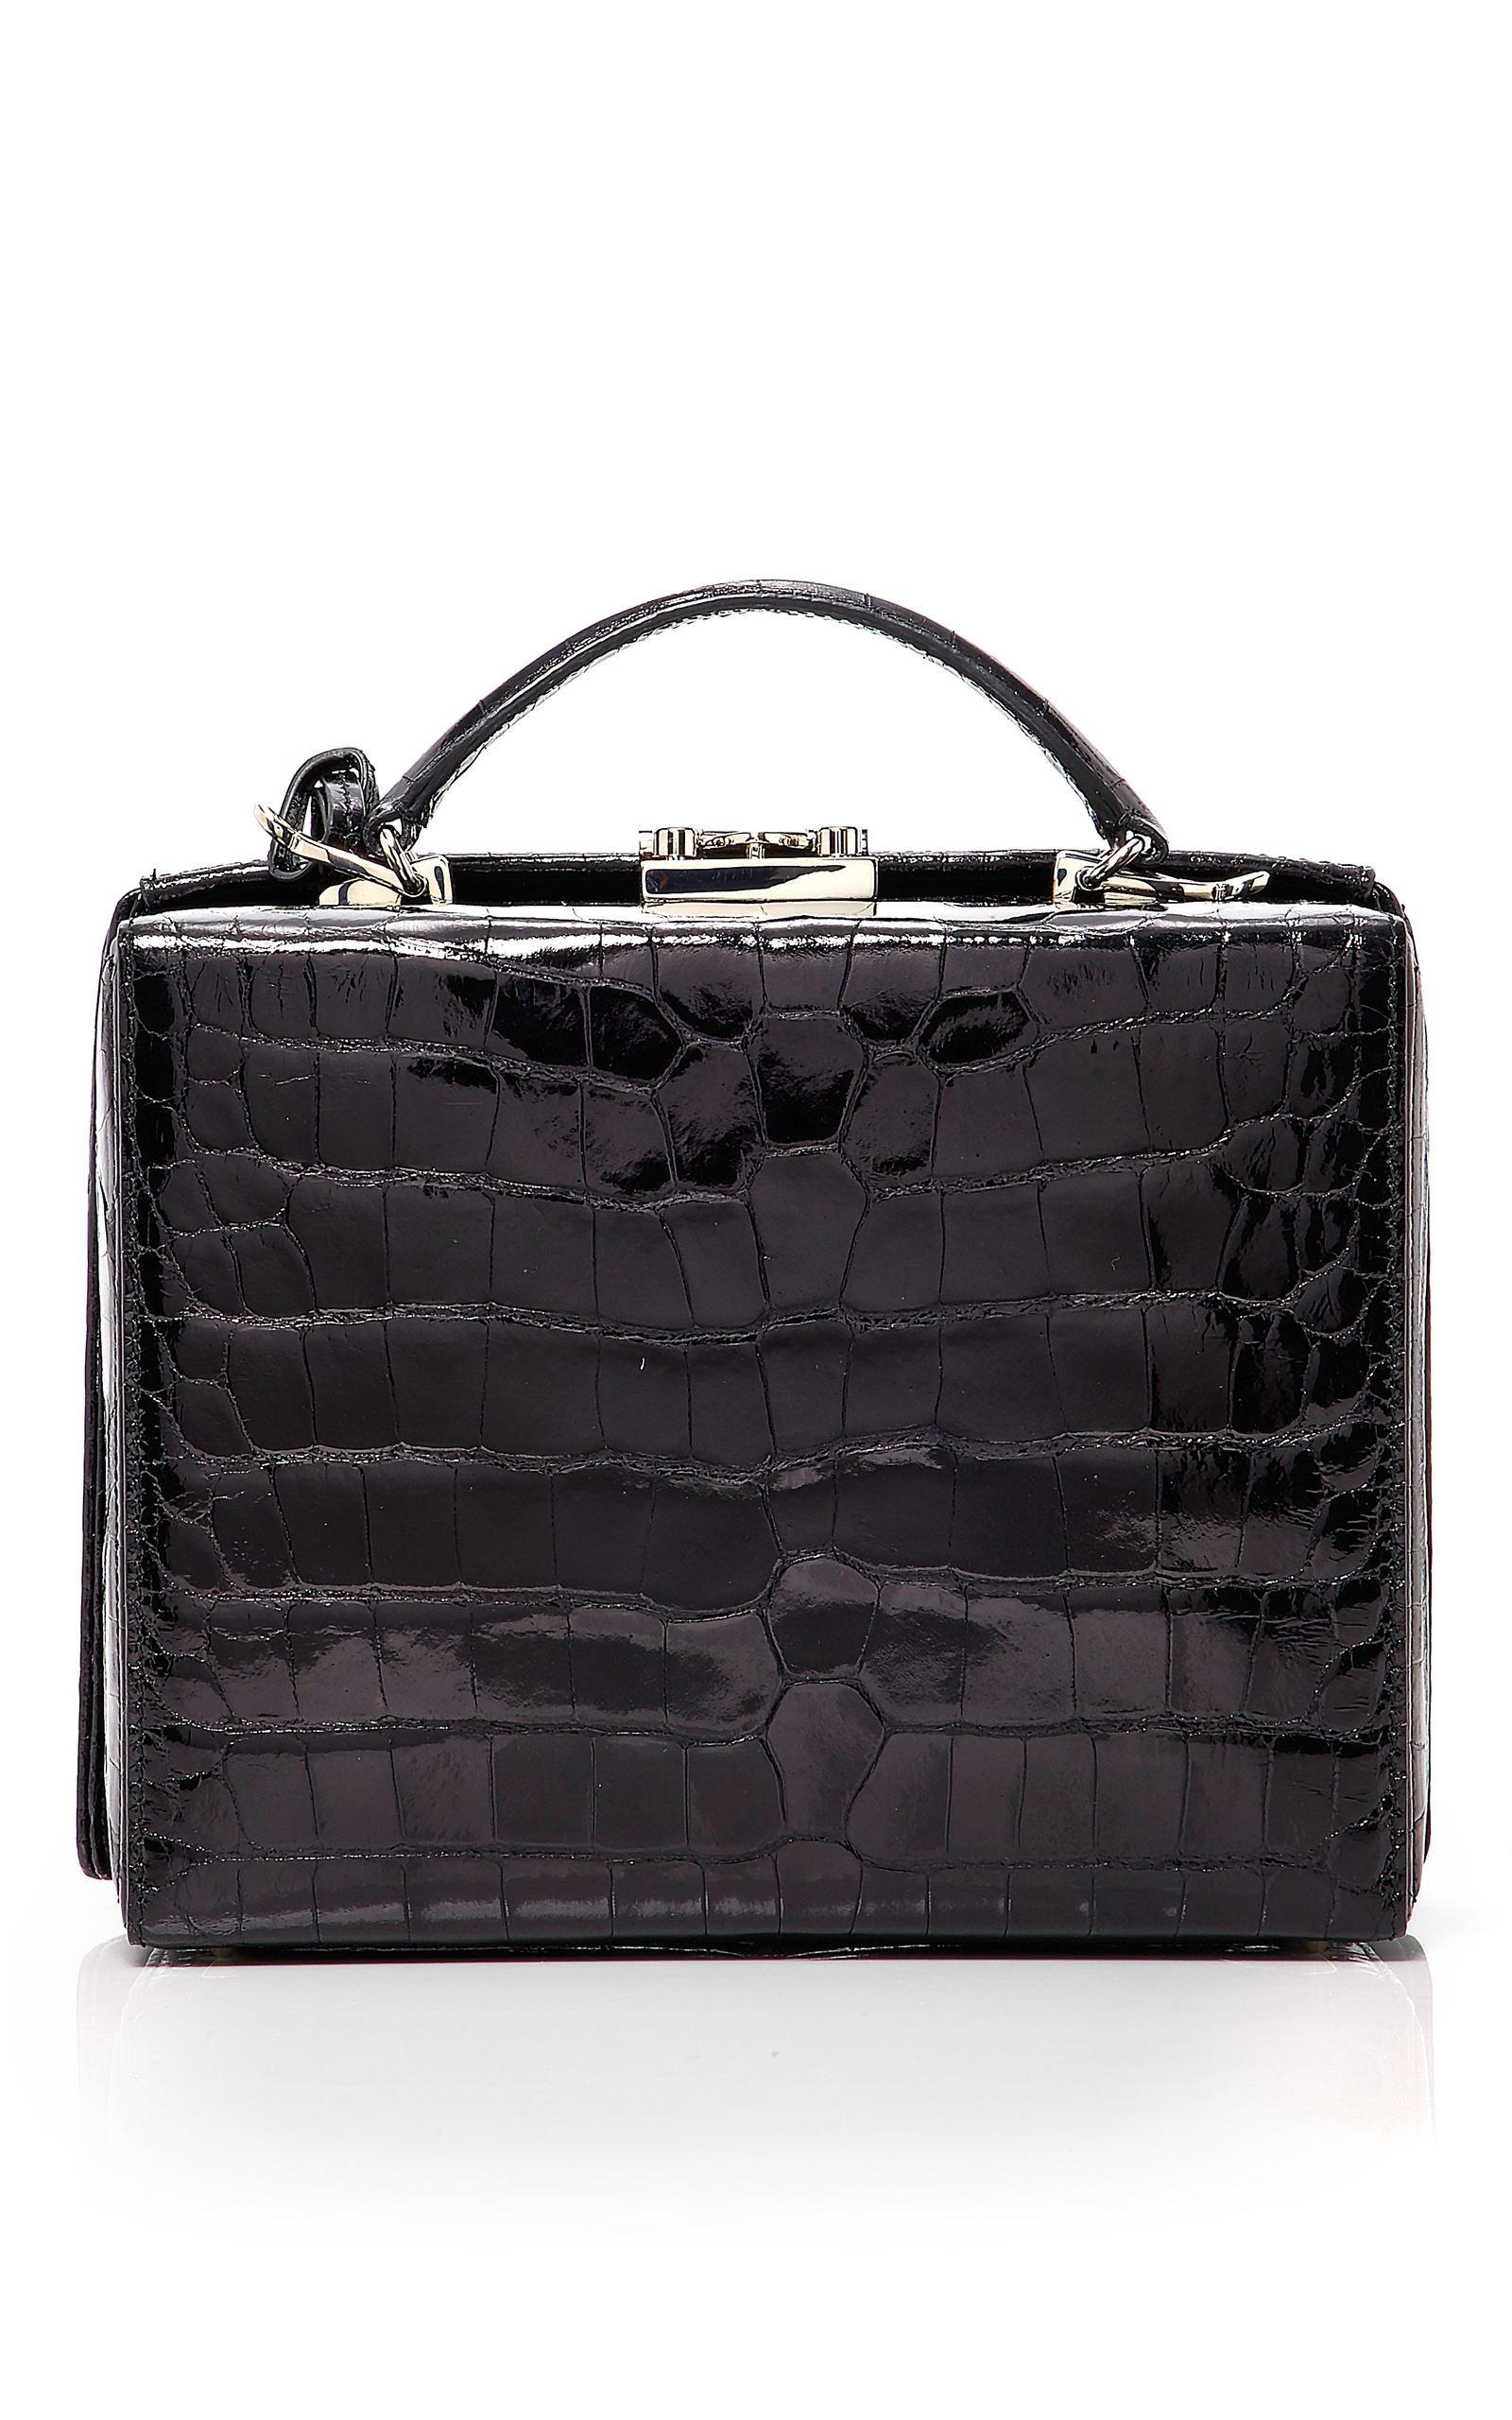 809d65870644 Mark CrossCrocodile Grace Large Box Bag. CLOSE. Loading. Loading. Loading.  Loading